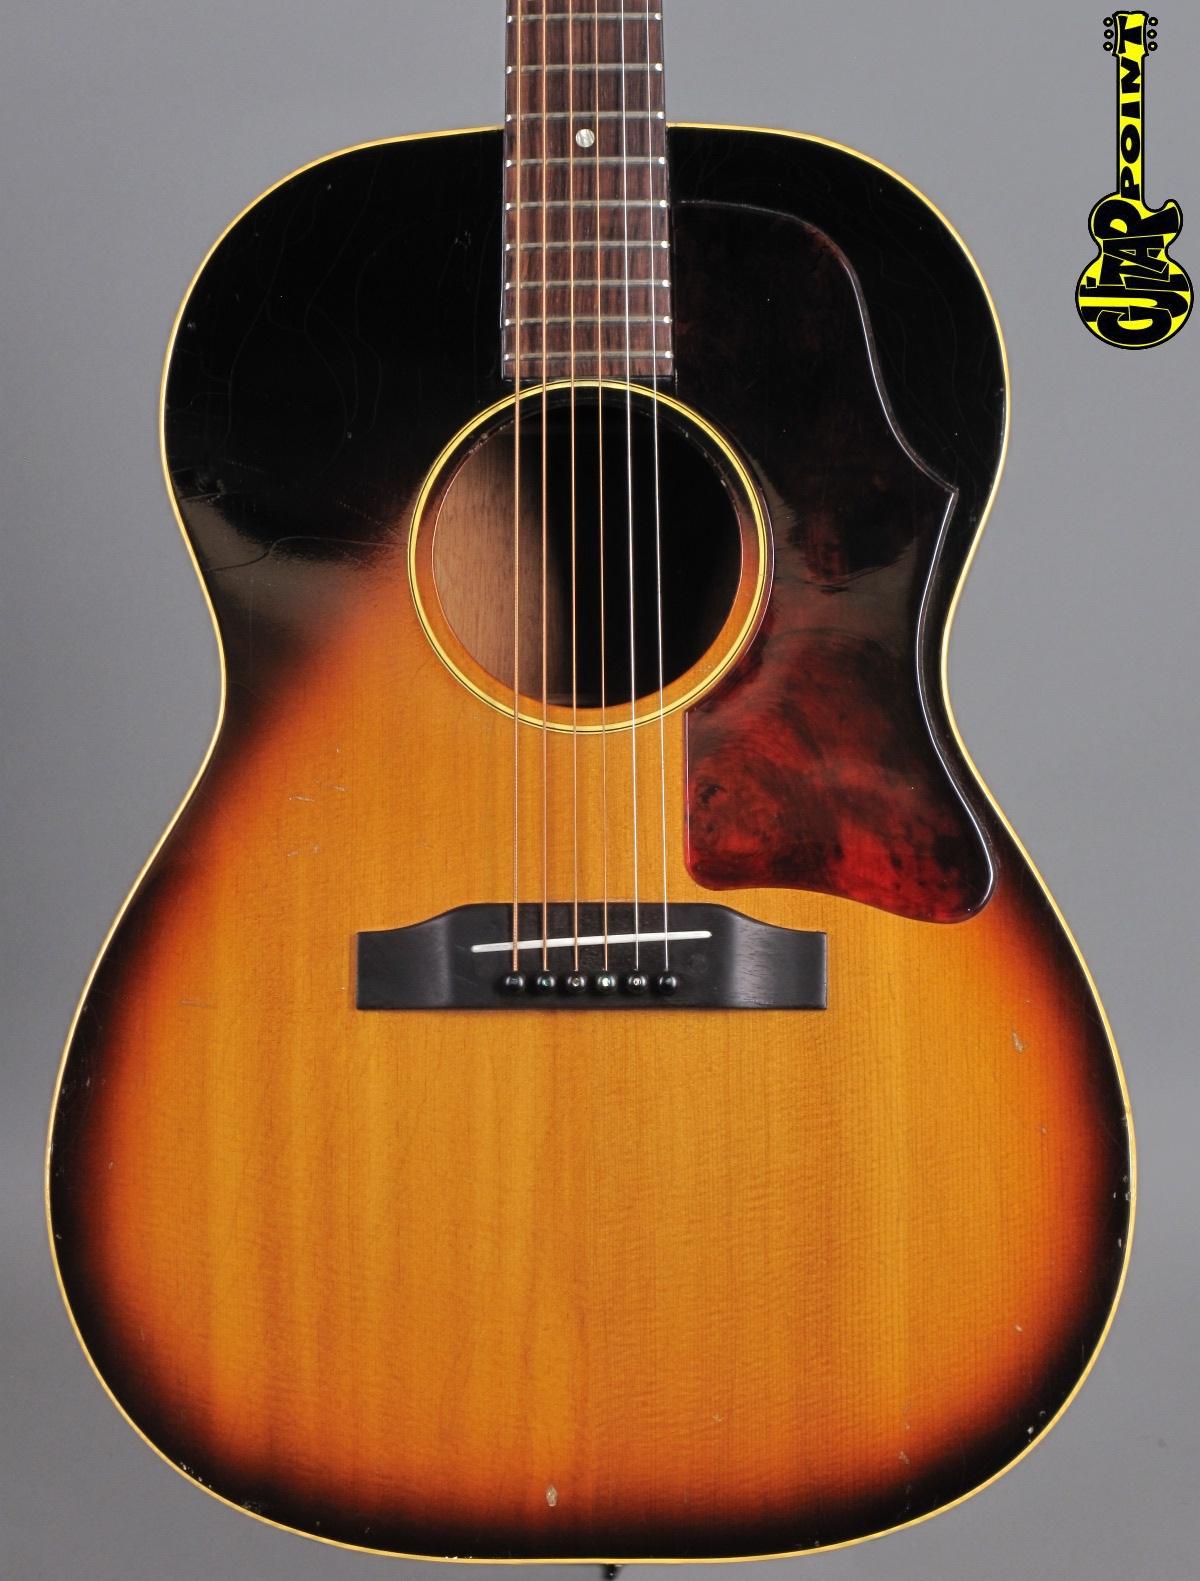 1964 Gibson LG-1 - Sunburst